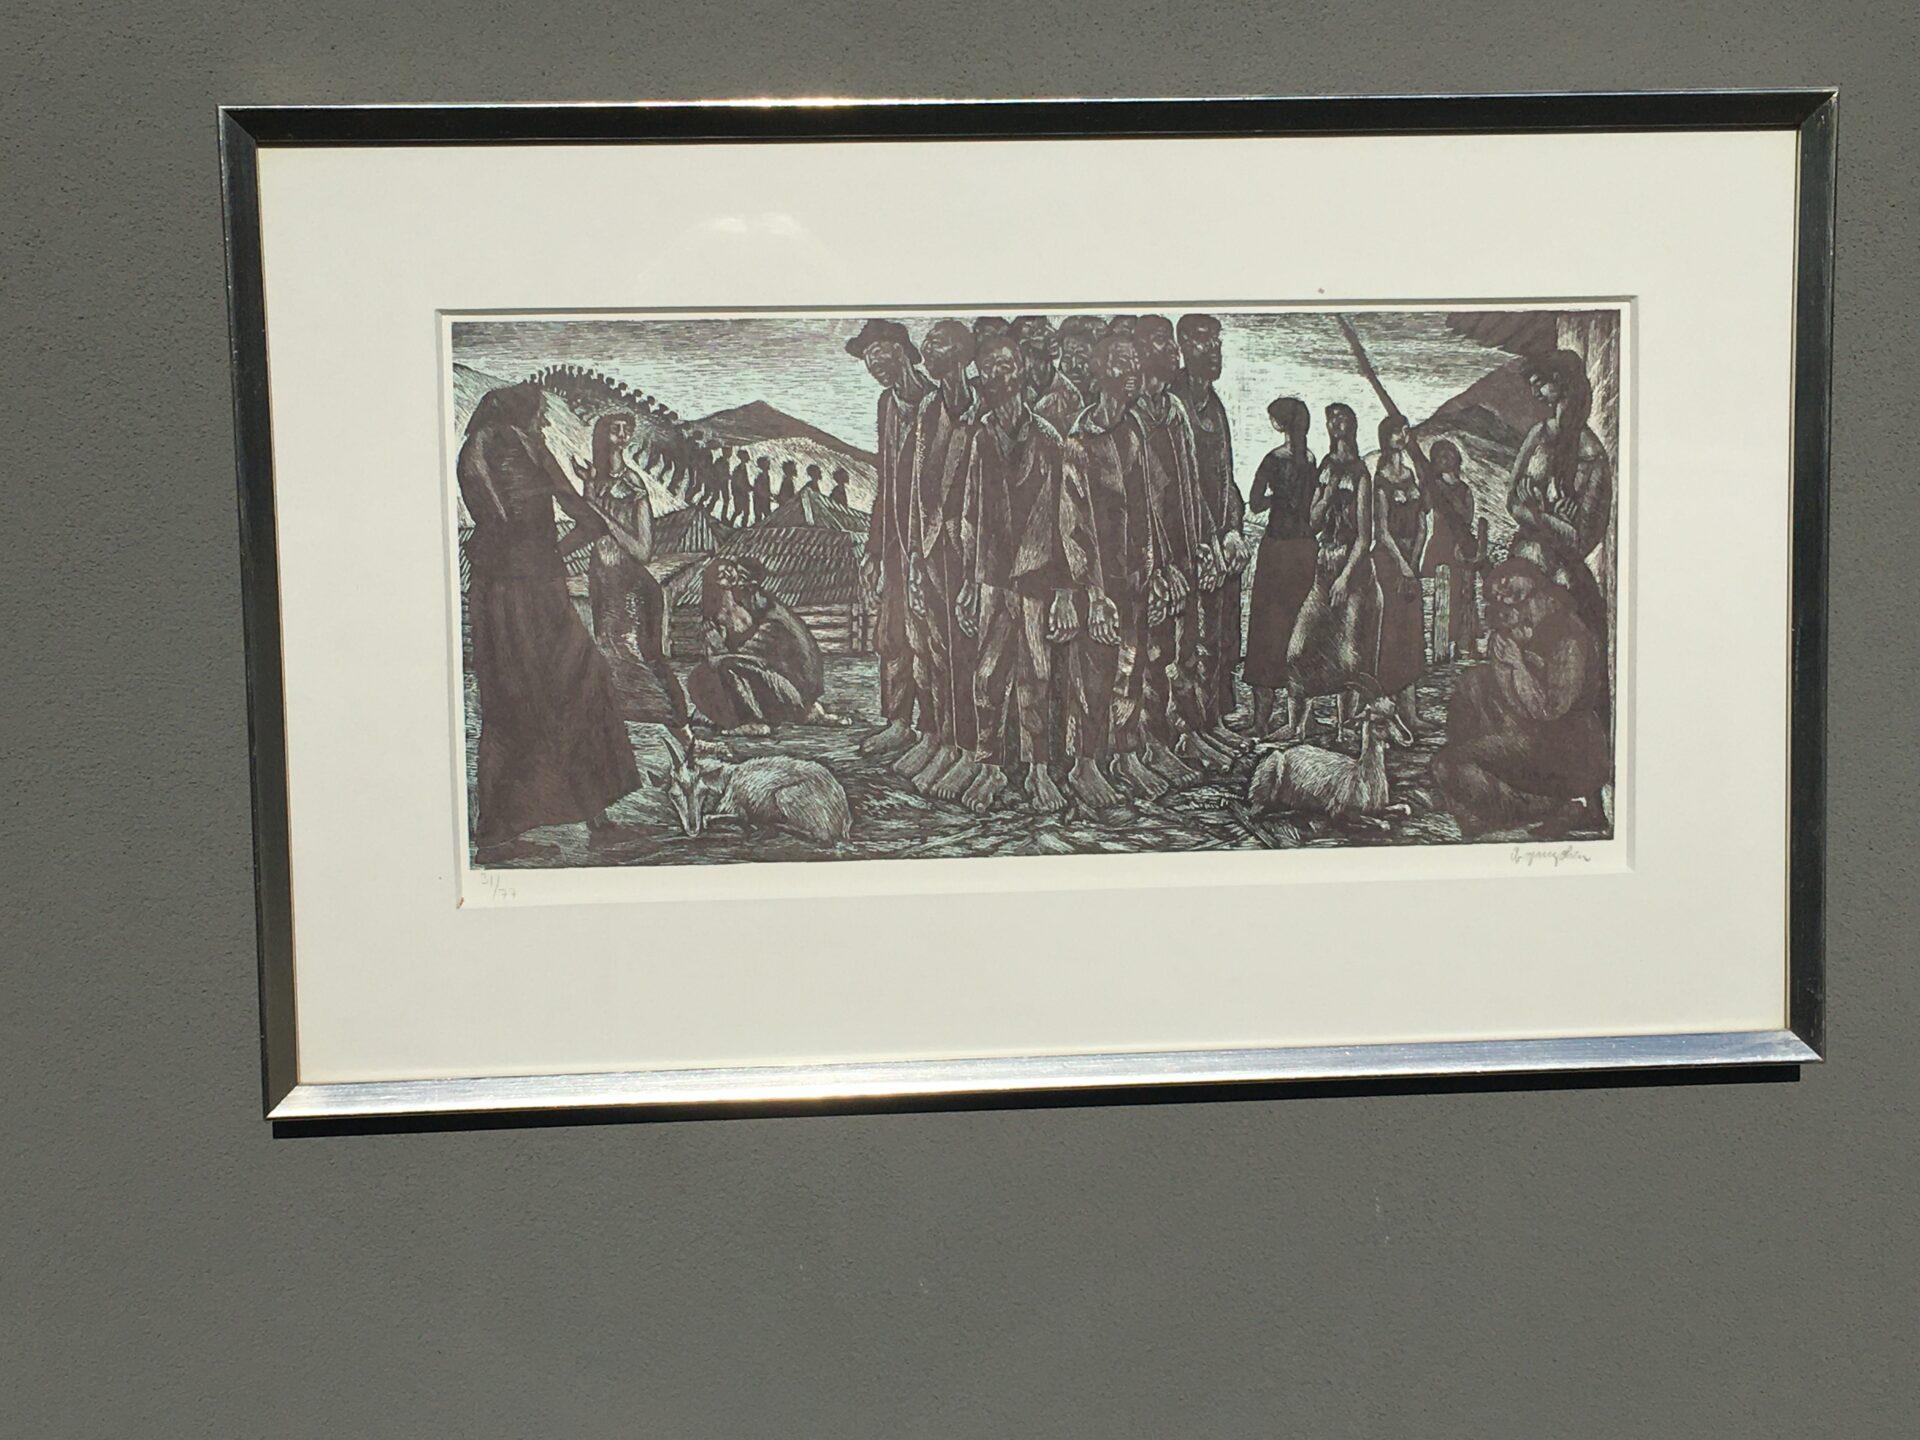 Ib Spang Olasen, litografi nr 31/77, signeret i bly, rammemål 43x69 cm, pris 500kr